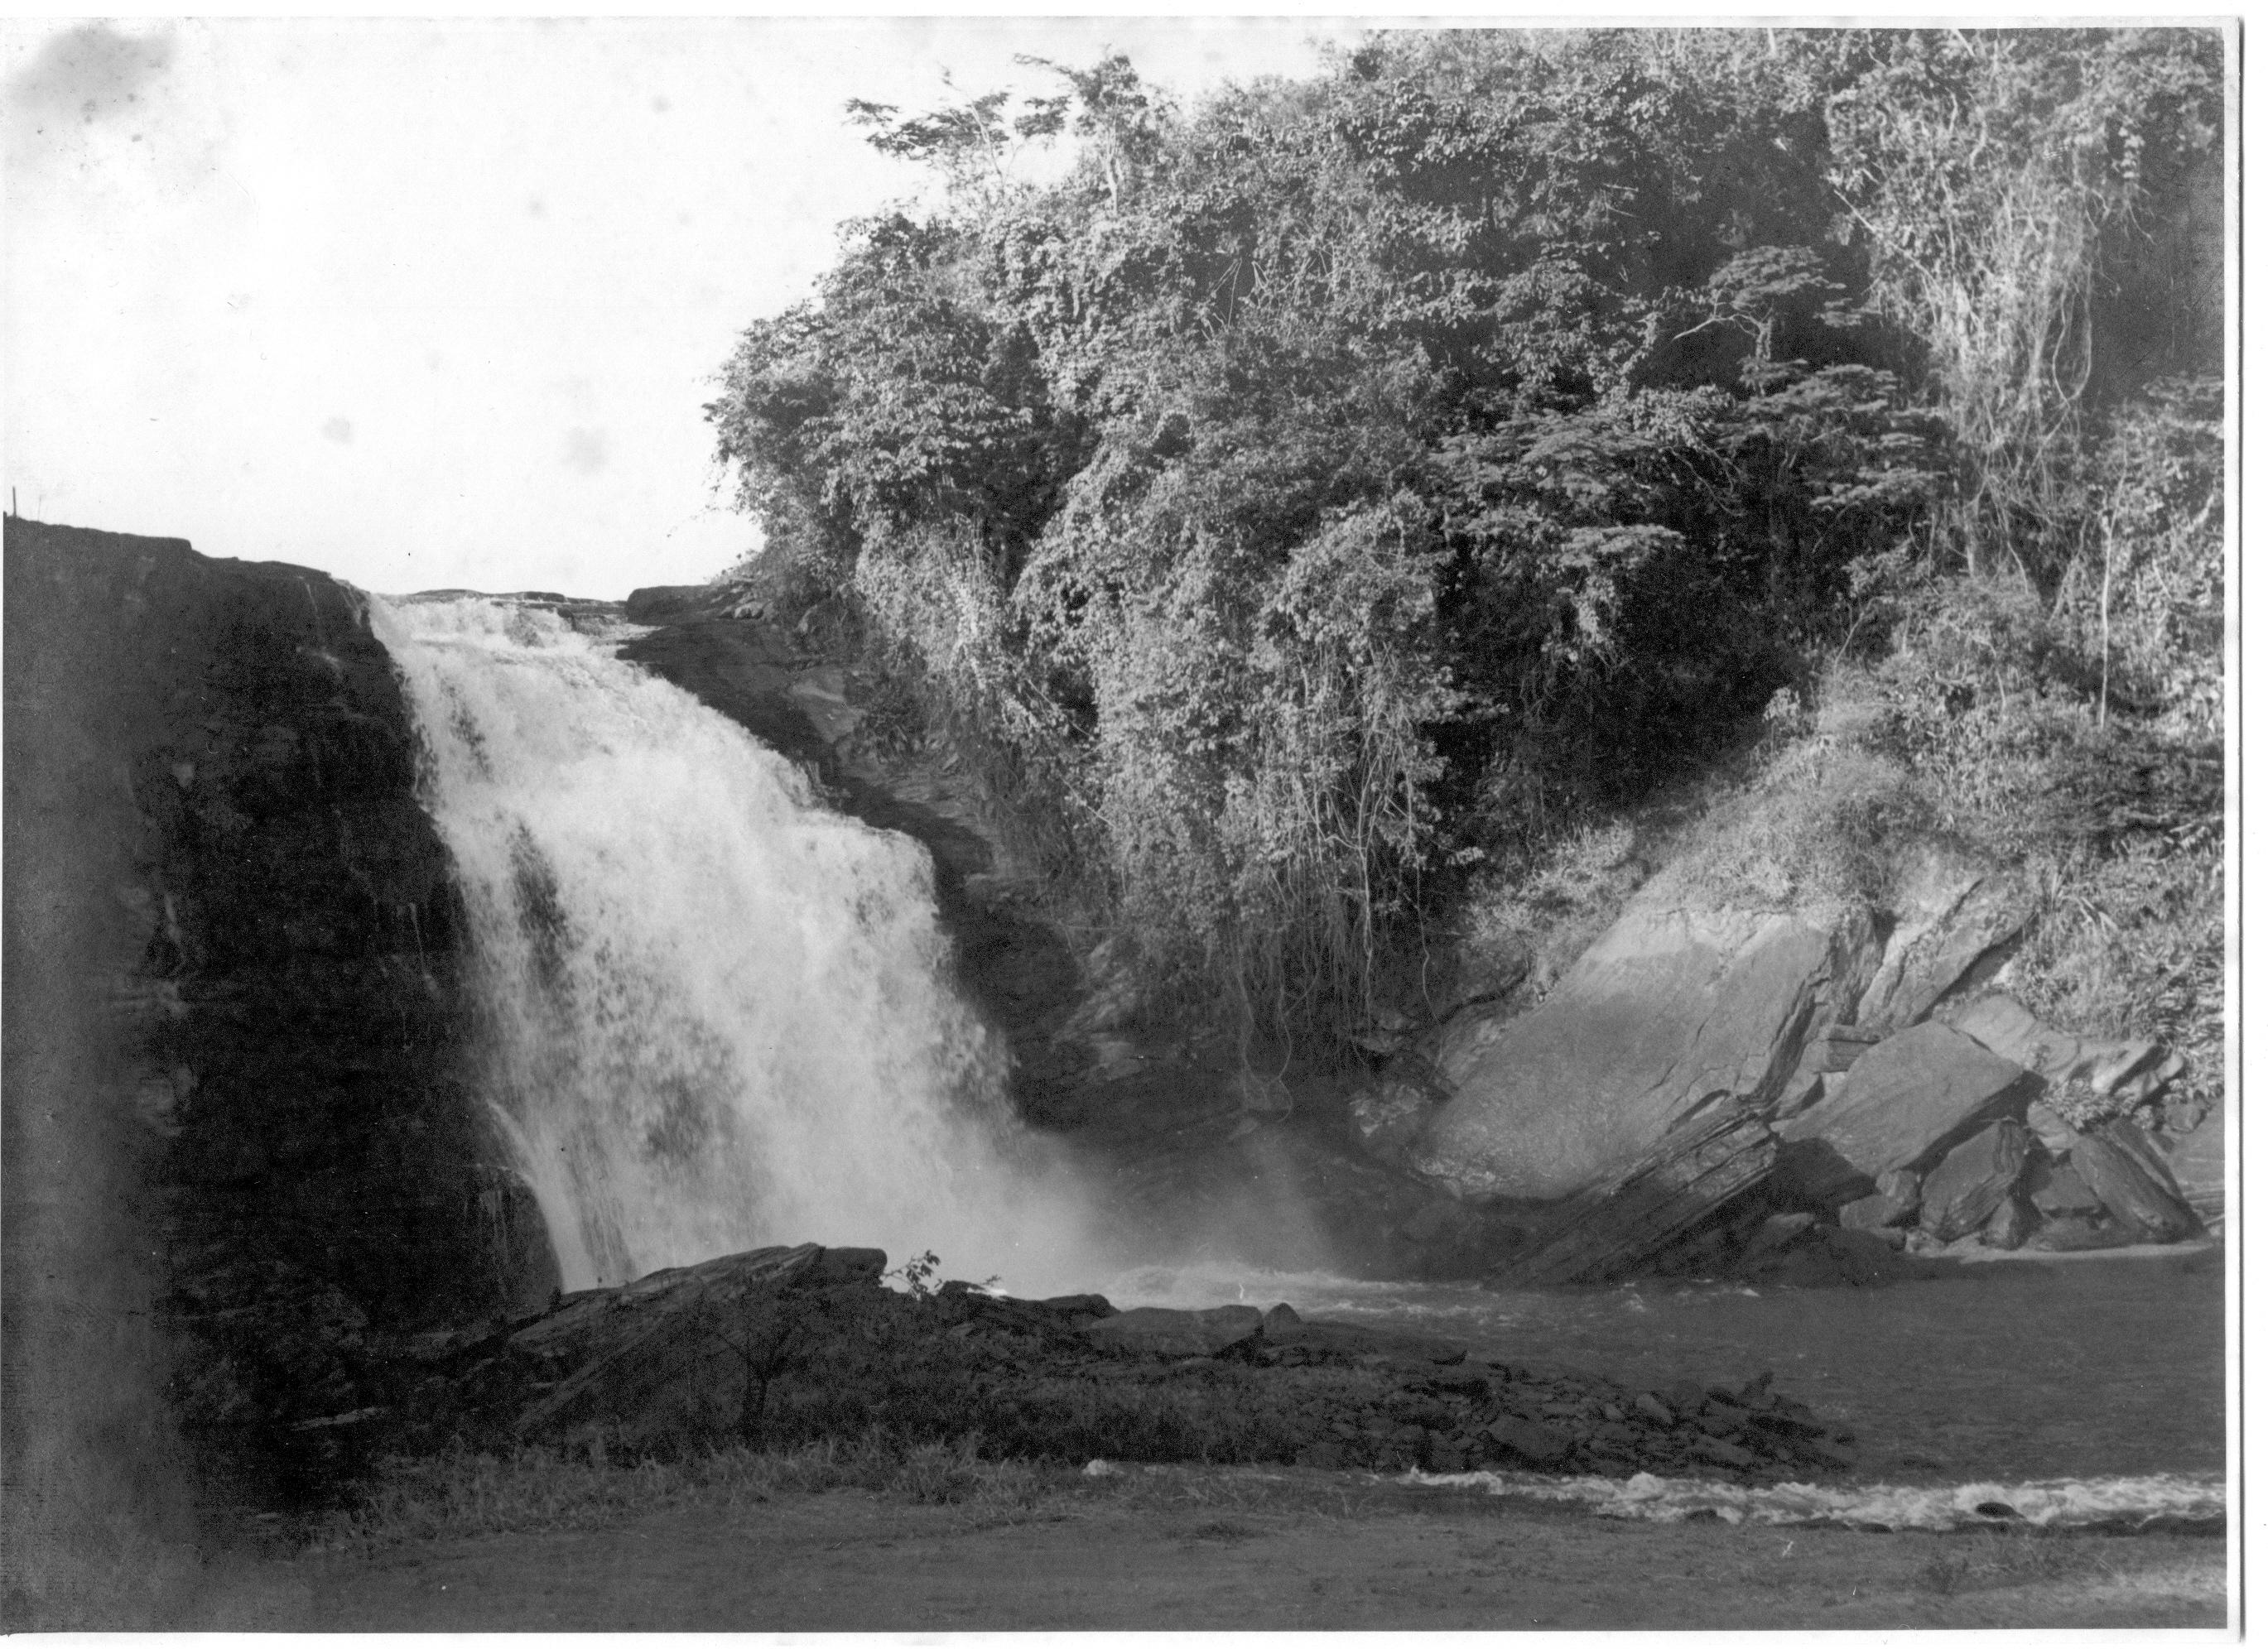 foto045-PCH cachoeira02PB